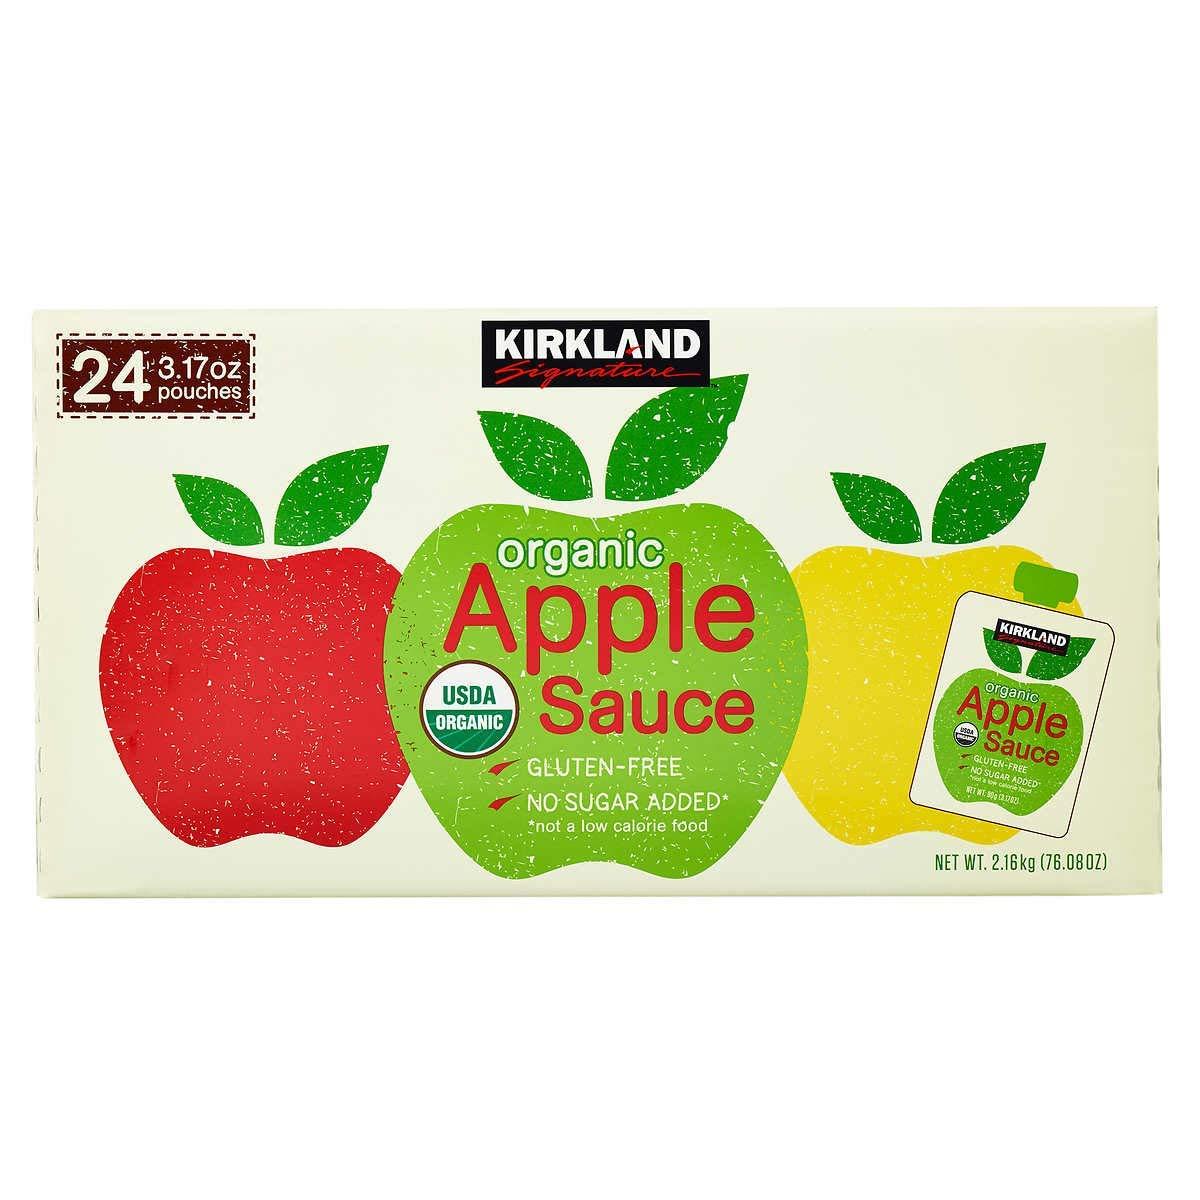 Kirkland Signature Organic Applesauce Pouch, 24 Count